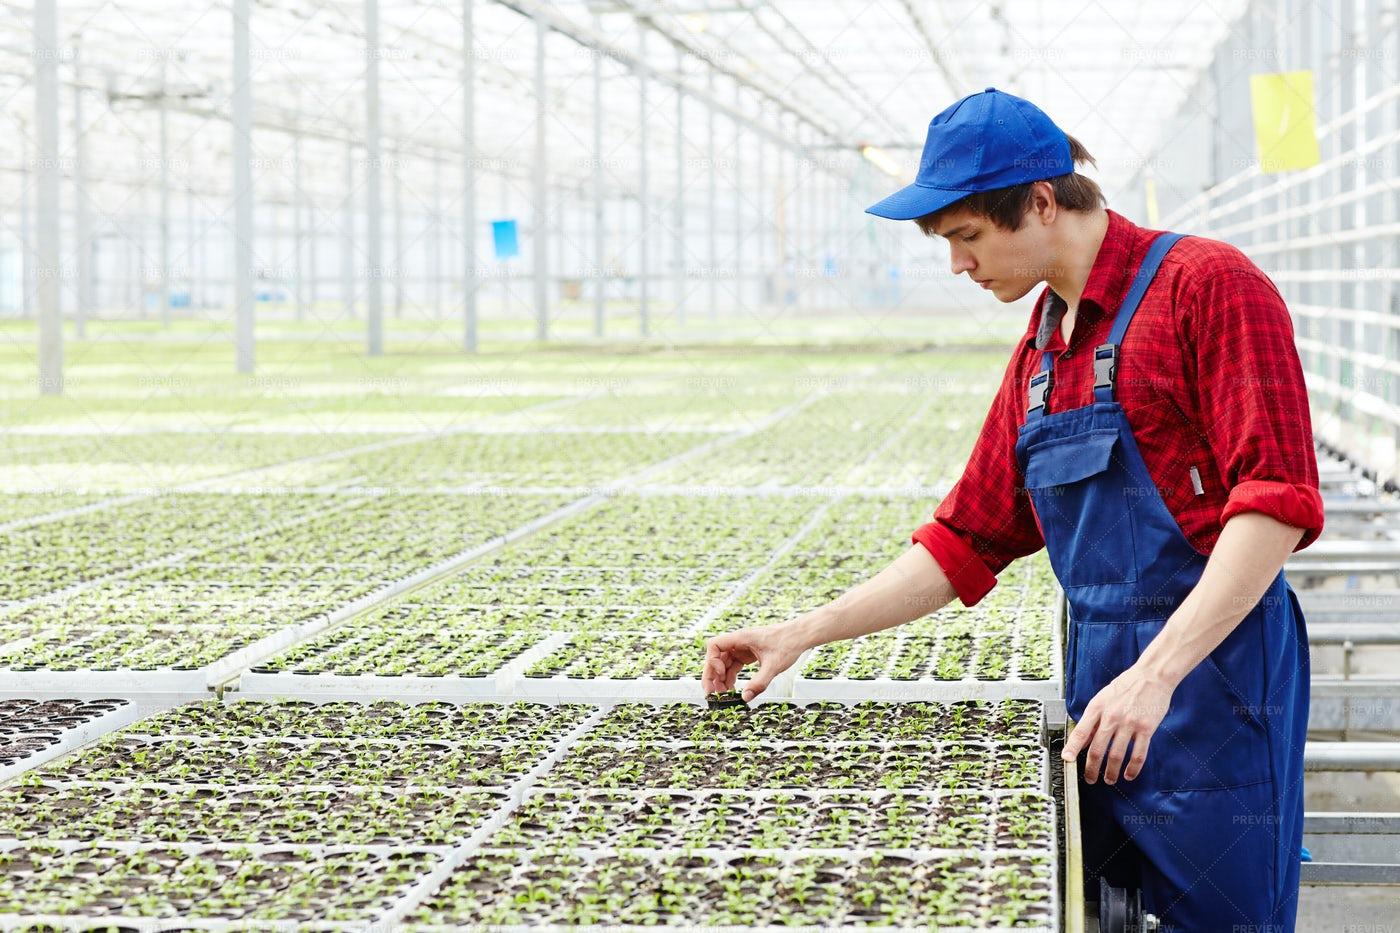 Sorting Seedlings: Stock Photos